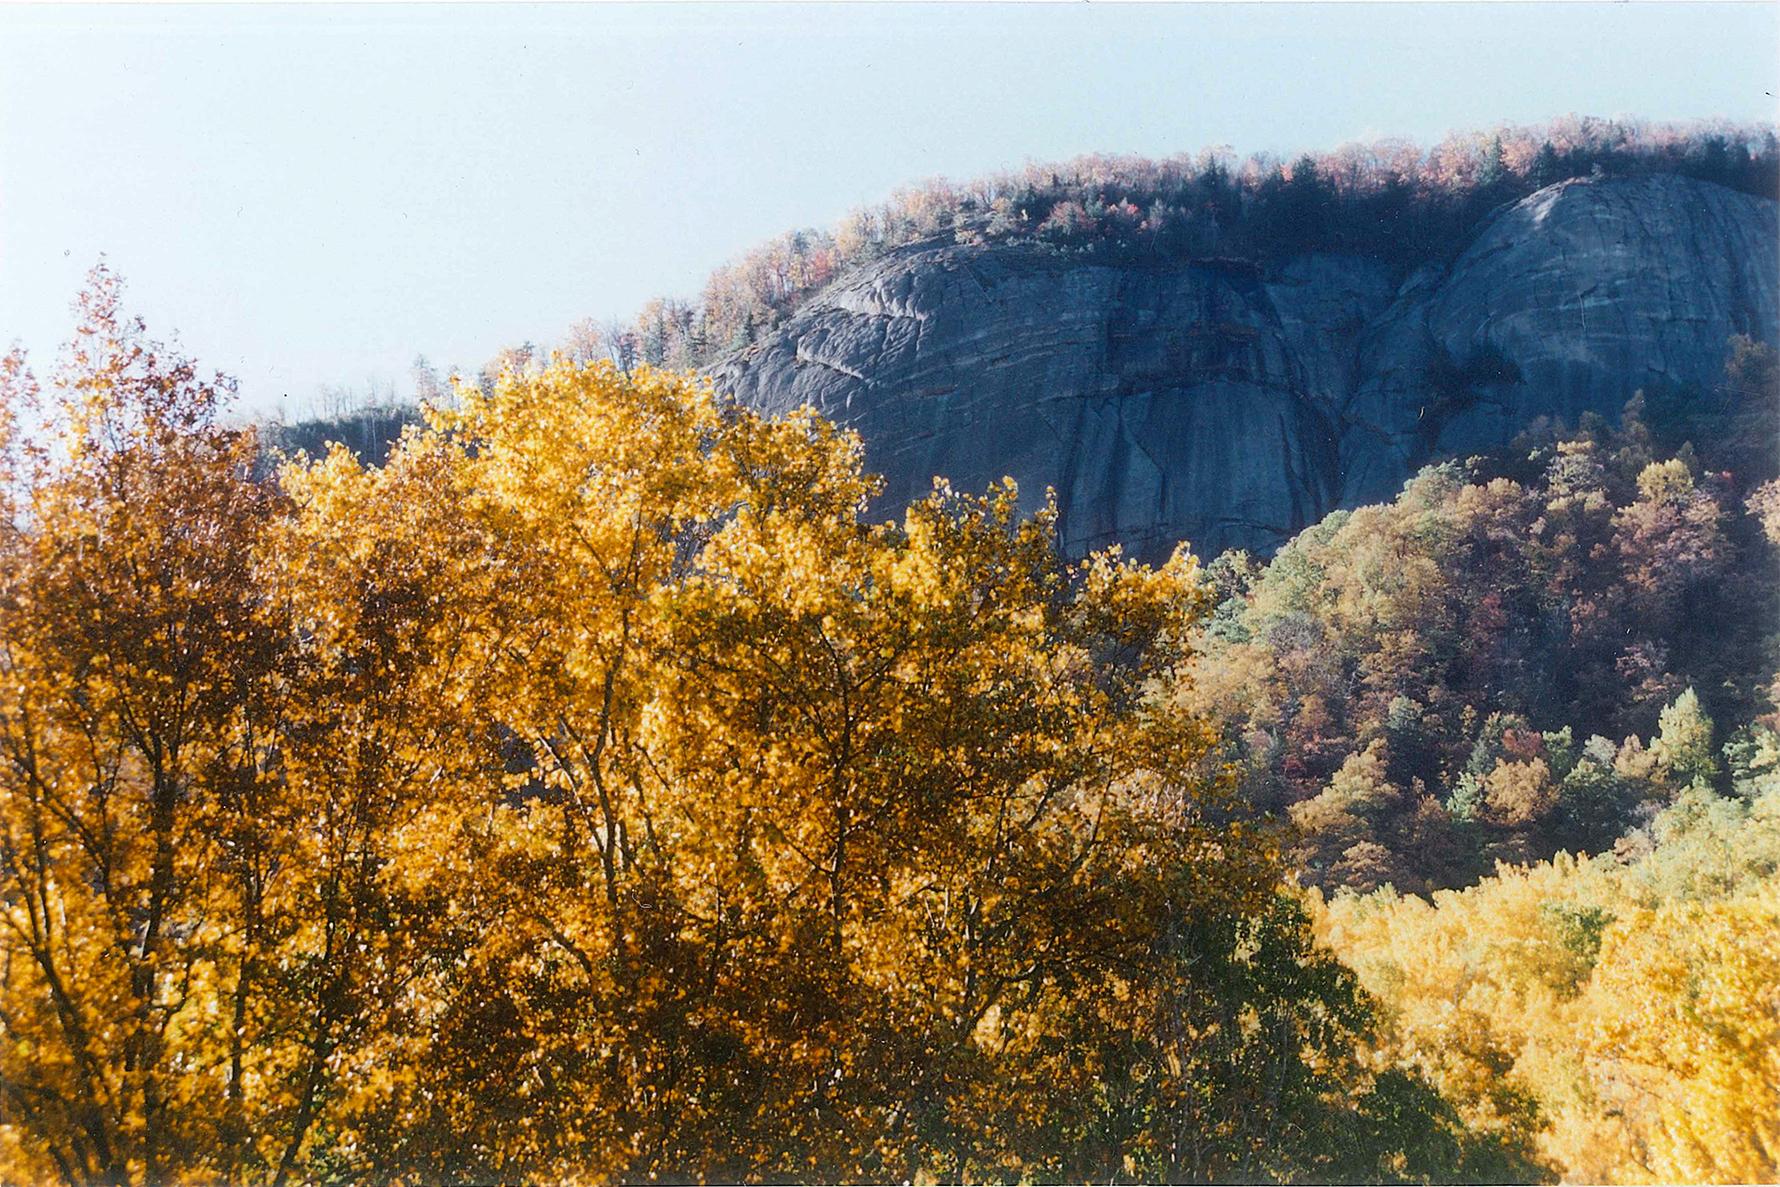 hook-mountain-in-nyack-ny-fall-2014-ann-adelstein.jpg